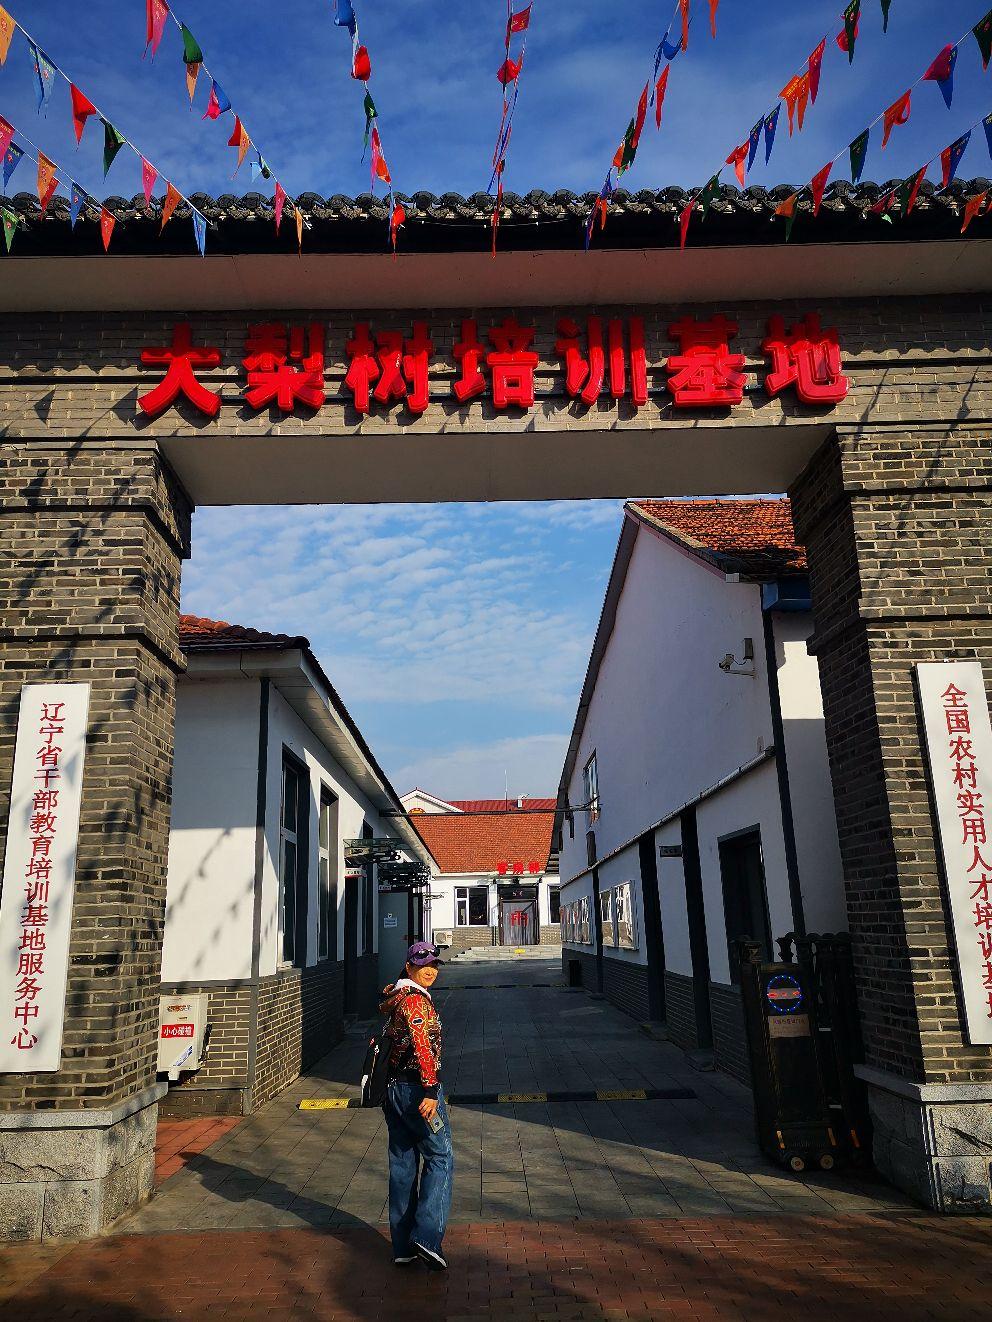 Dalishu Cuncun Shi Exhibition hall